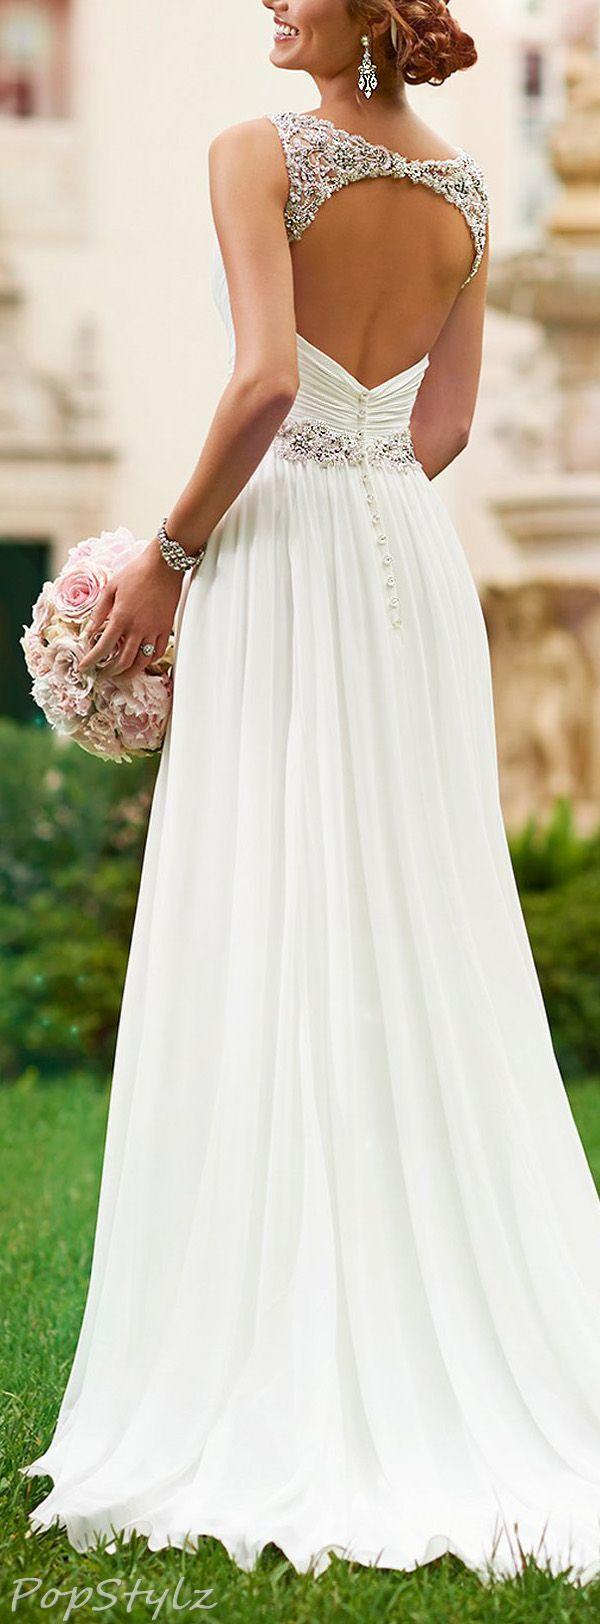 Wedding dress back   best wedding ideas images on Pinterest  Weddings Wedding ideas